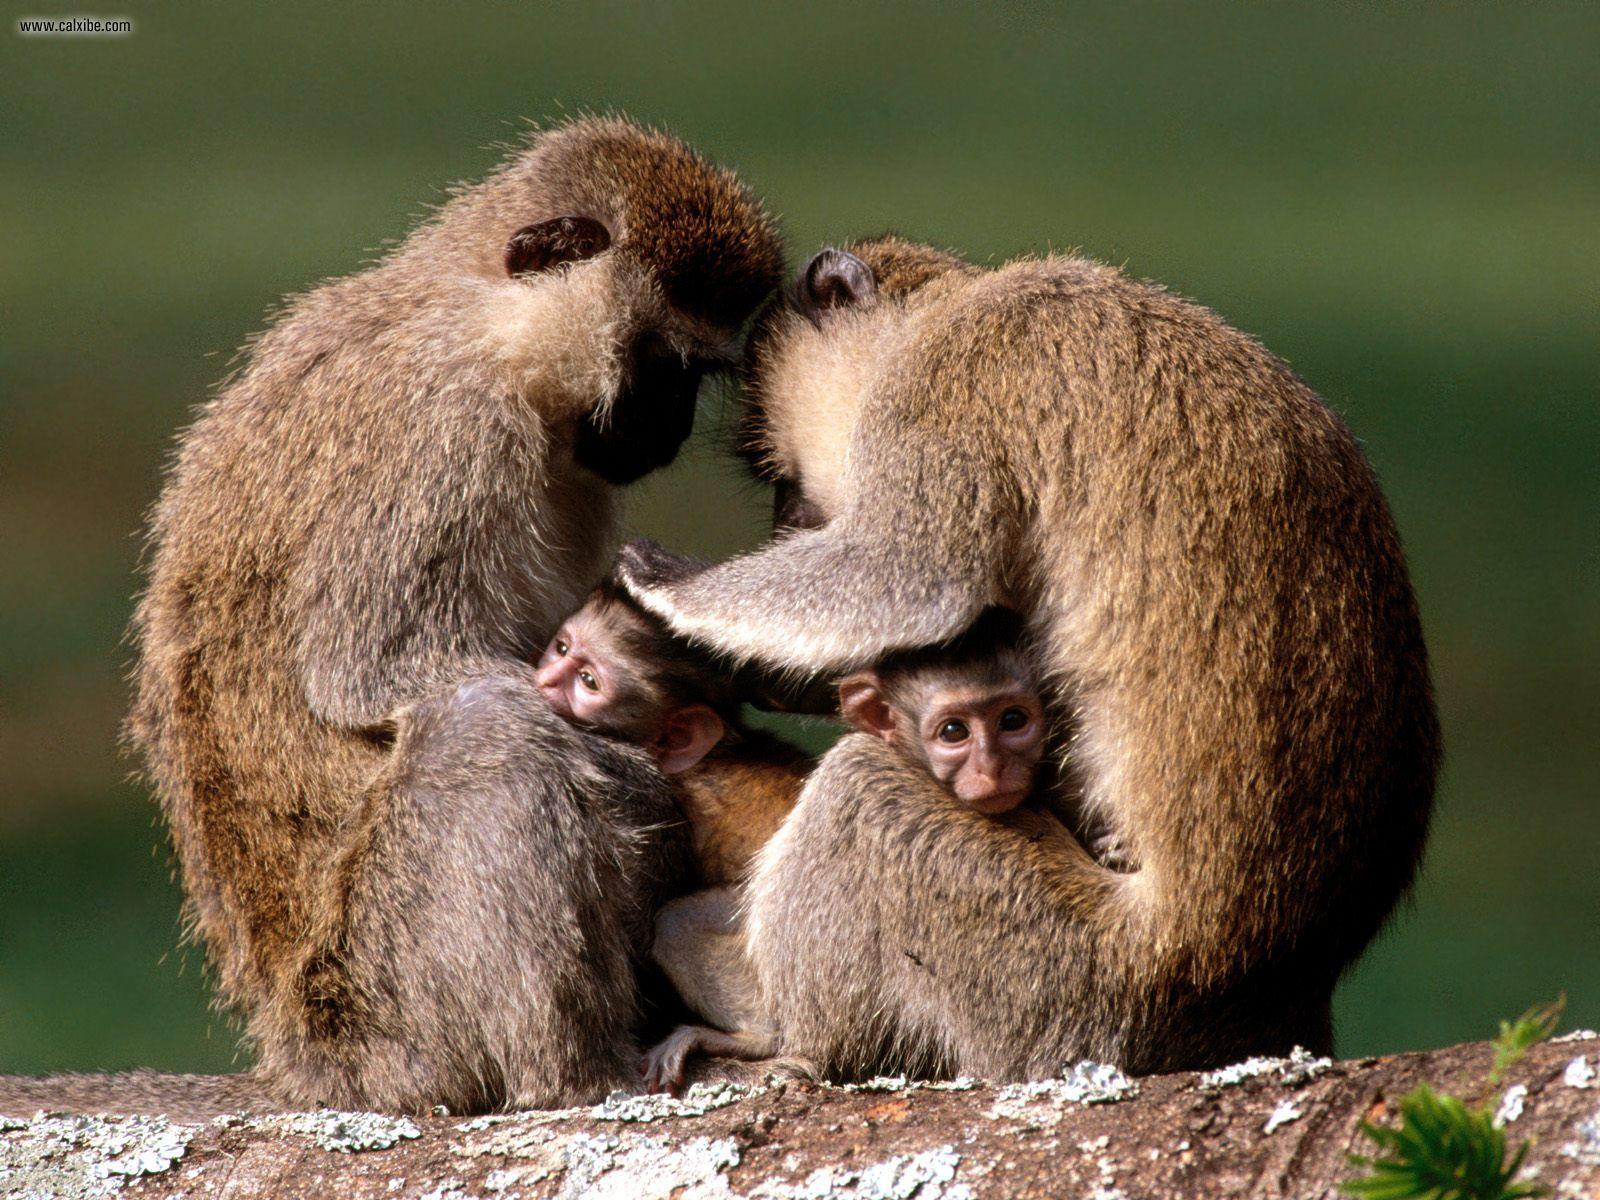 Animals: Vervet Monkeys Uganda Africa, picture nr. 23923